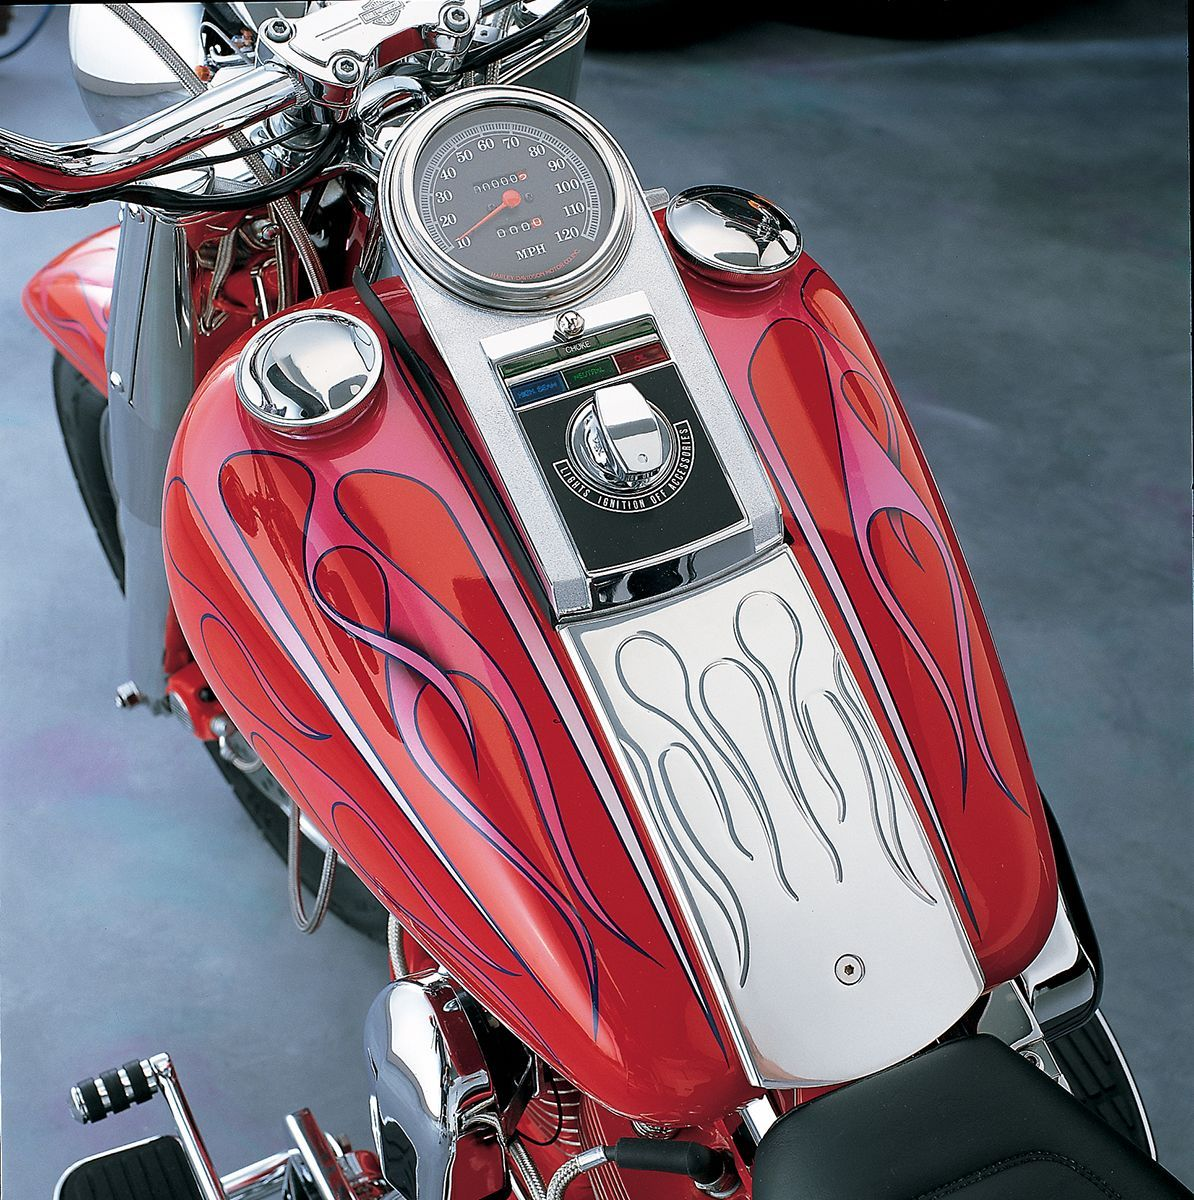 【Drag Specialties】儀表蓋/68-84FLH 80-90 FXST 【DASH 68-84FLH,80-90 FXST [DS-373670]】 - 「Webike-摩托百貨」